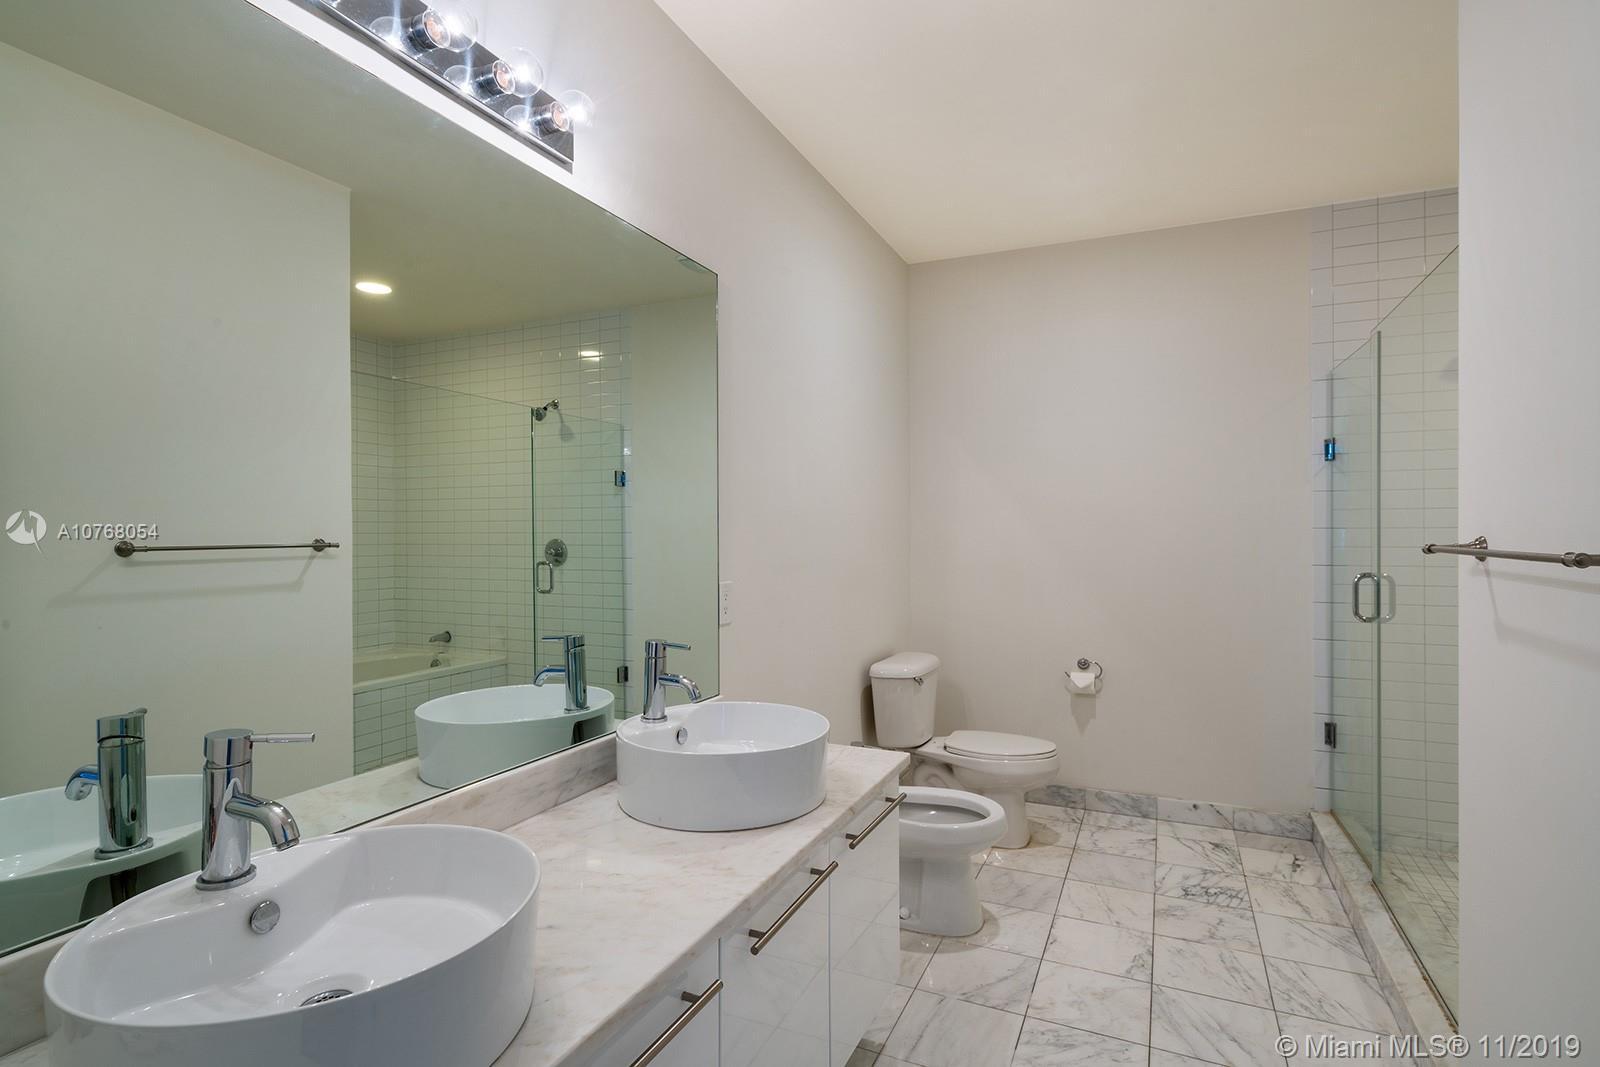 888 Biscayne Blvd # 4606, Miami, Florida 33132, 1 Bedroom Bedrooms, ,2 BathroomsBathrooms,Residential,For Sale,888 Biscayne Blvd # 4606,A10768054